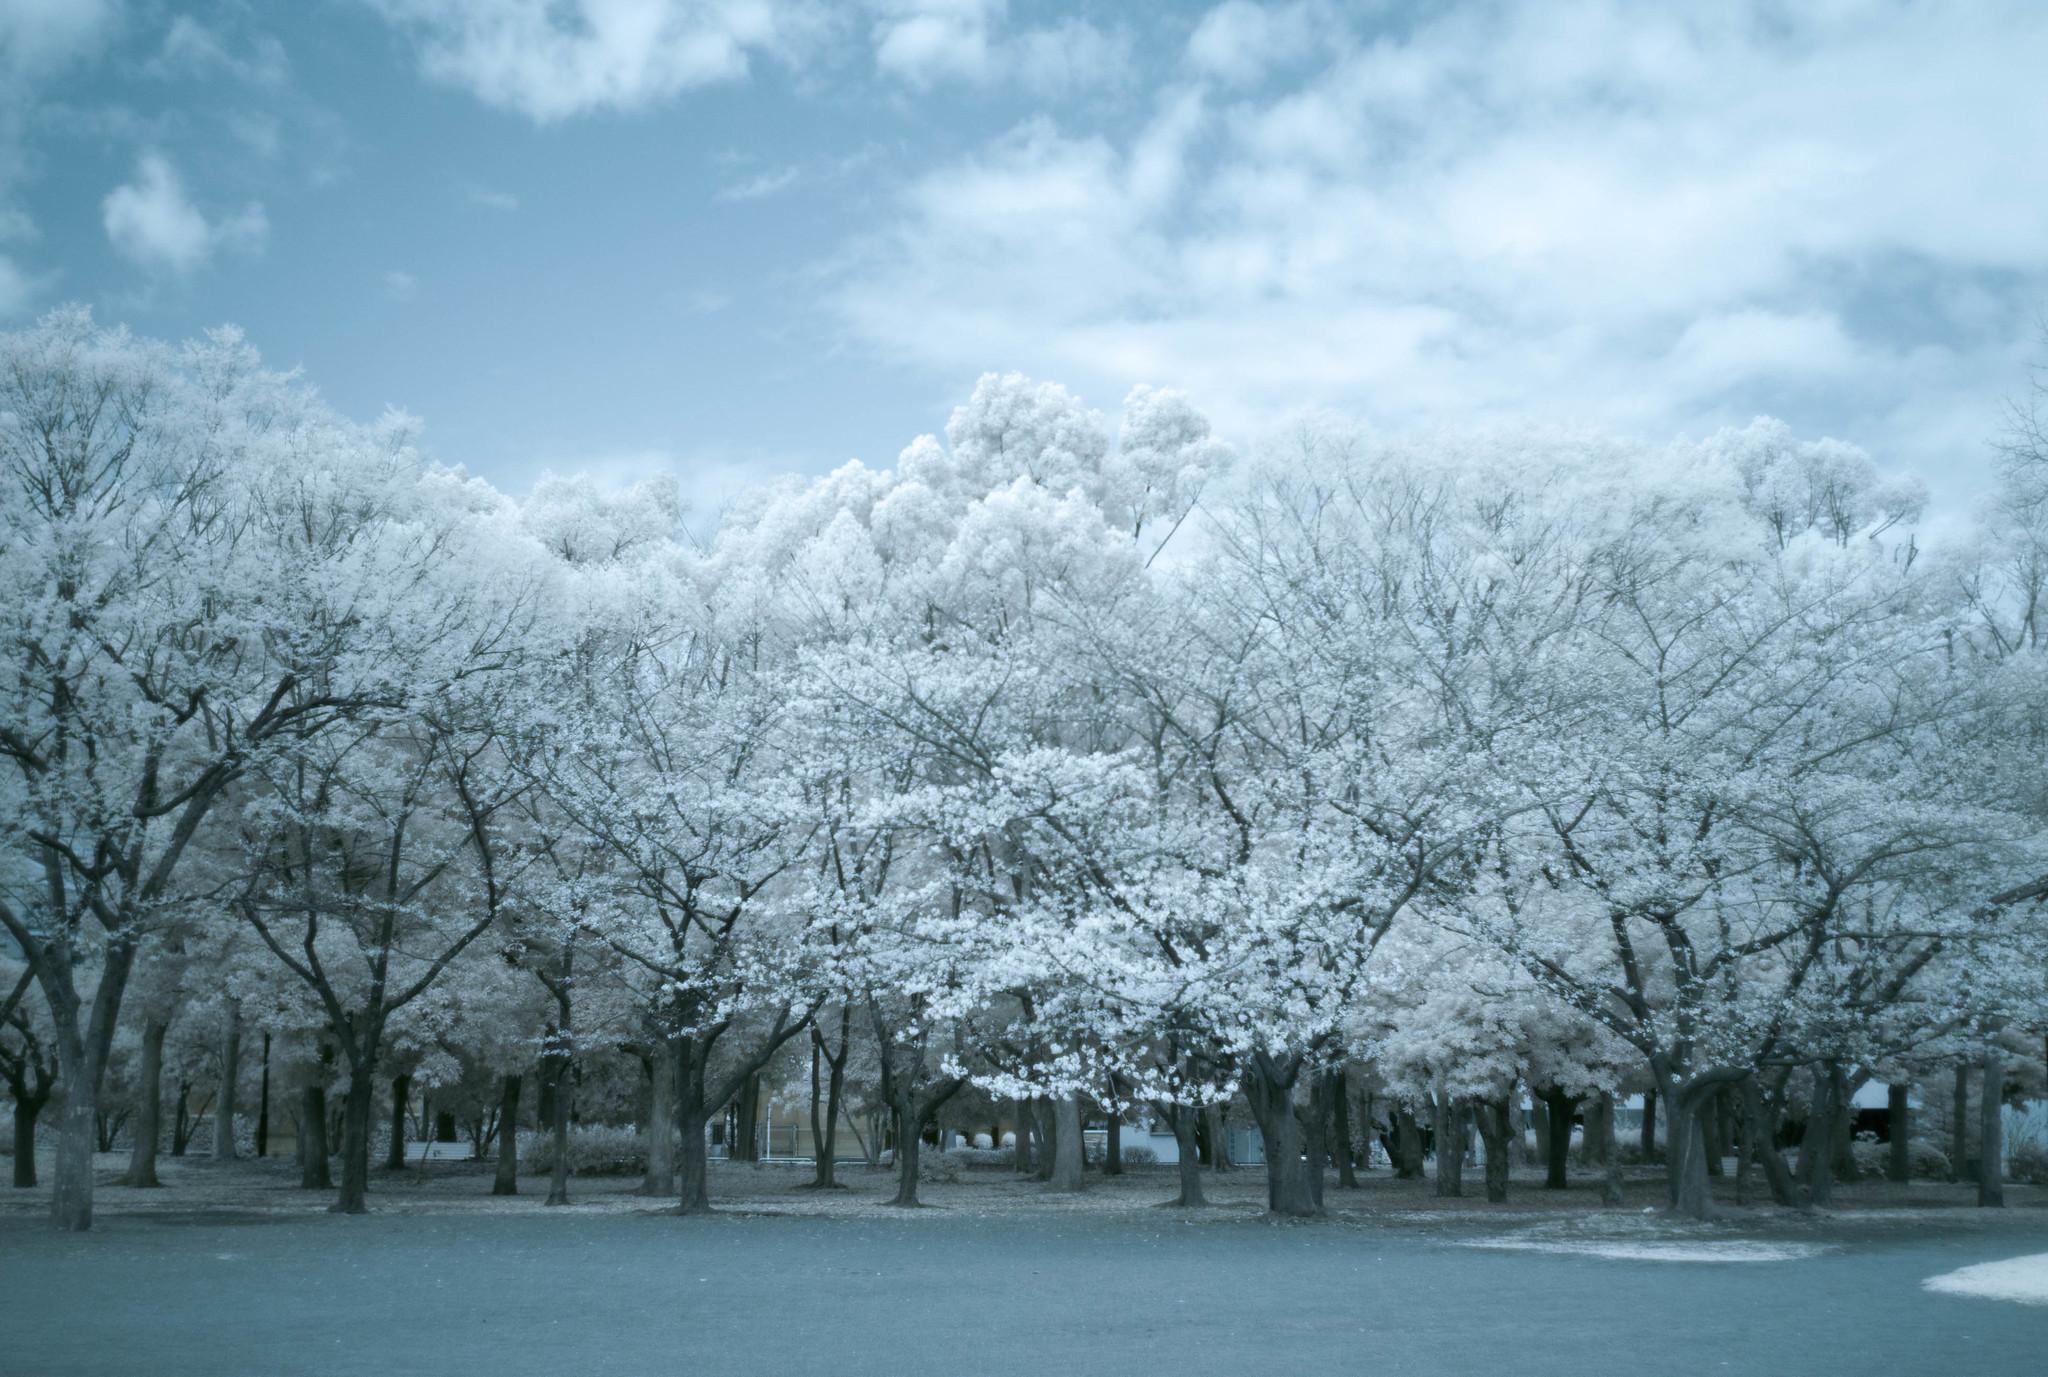 Kiyosumi Park(infrared photography)